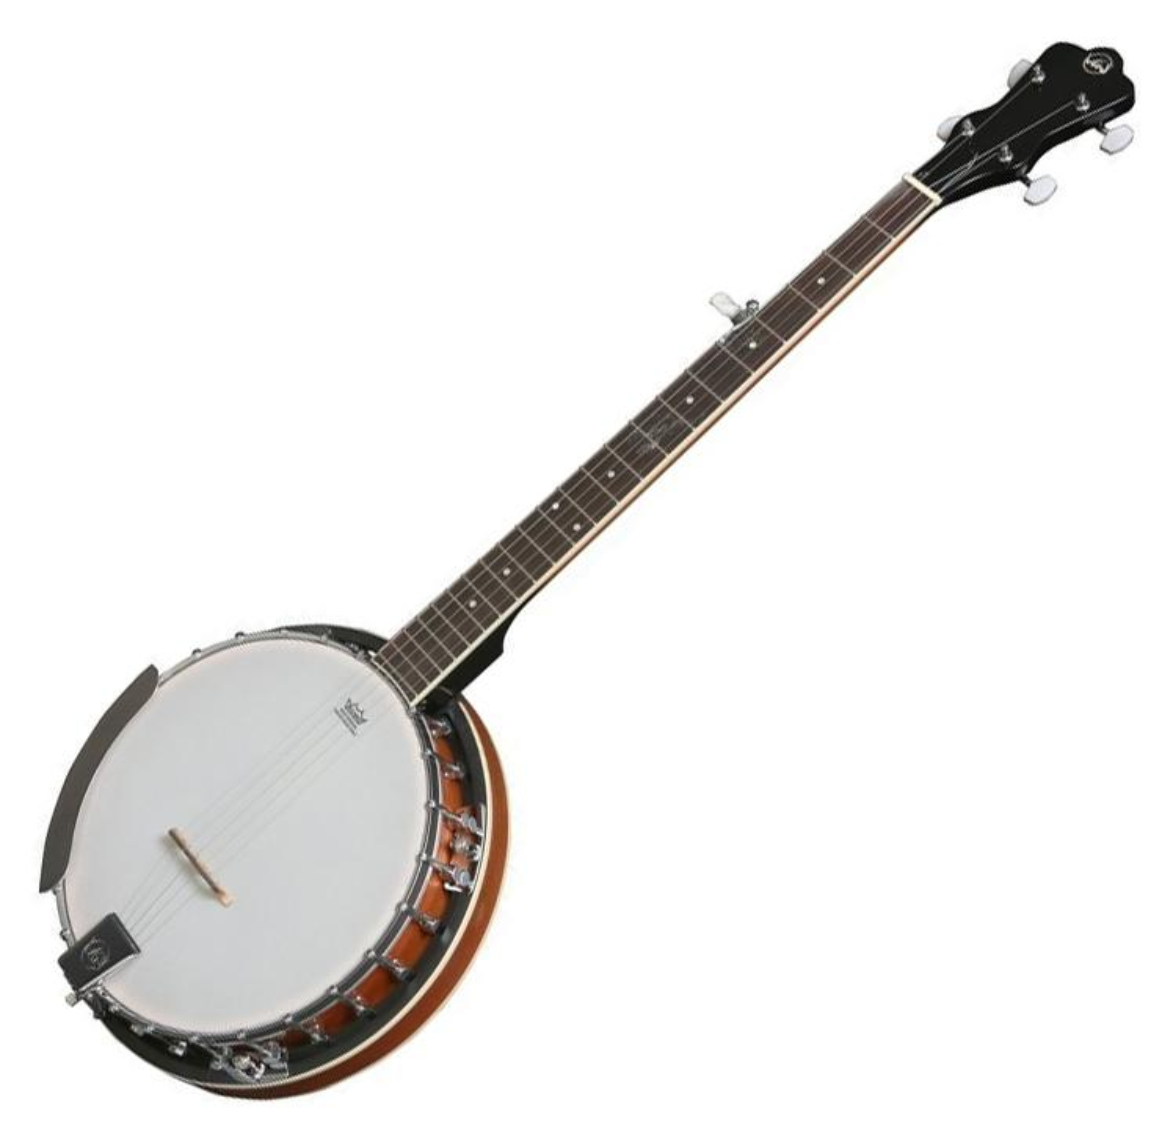 Sonstigezupf - VGS Select Banjo 5 string - Onlineshop Musikhaus Kirstein